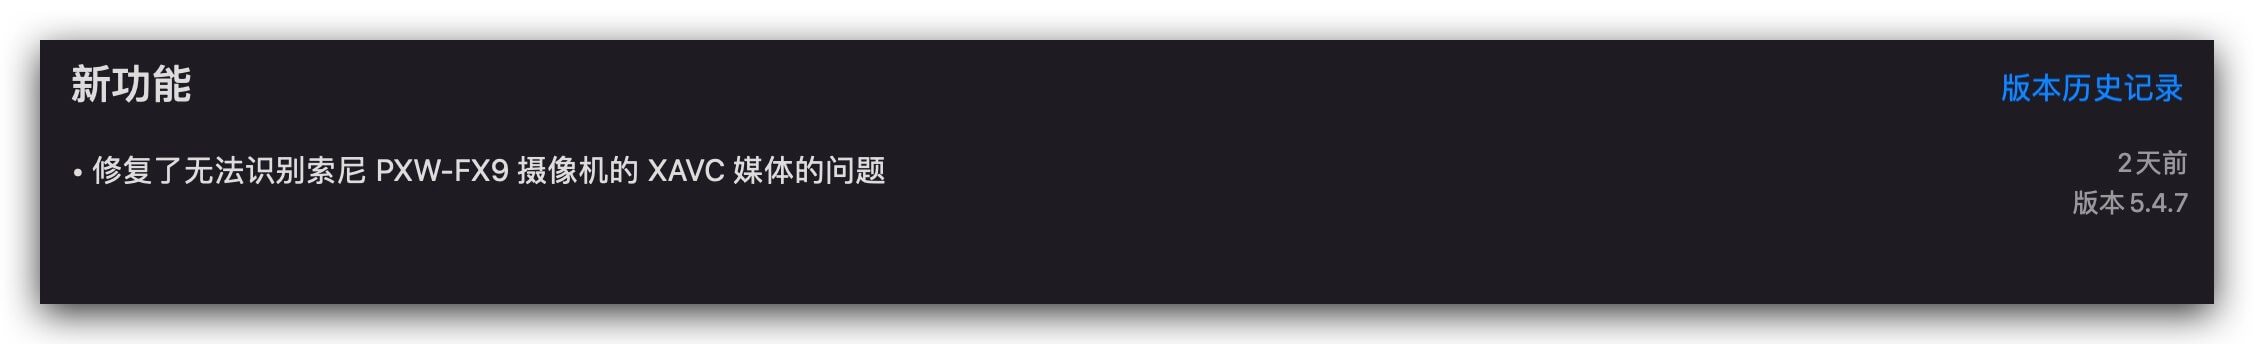 Apple Motion 5.4.7 破解版免费下载 中英文版 苹果视频剪辑软件